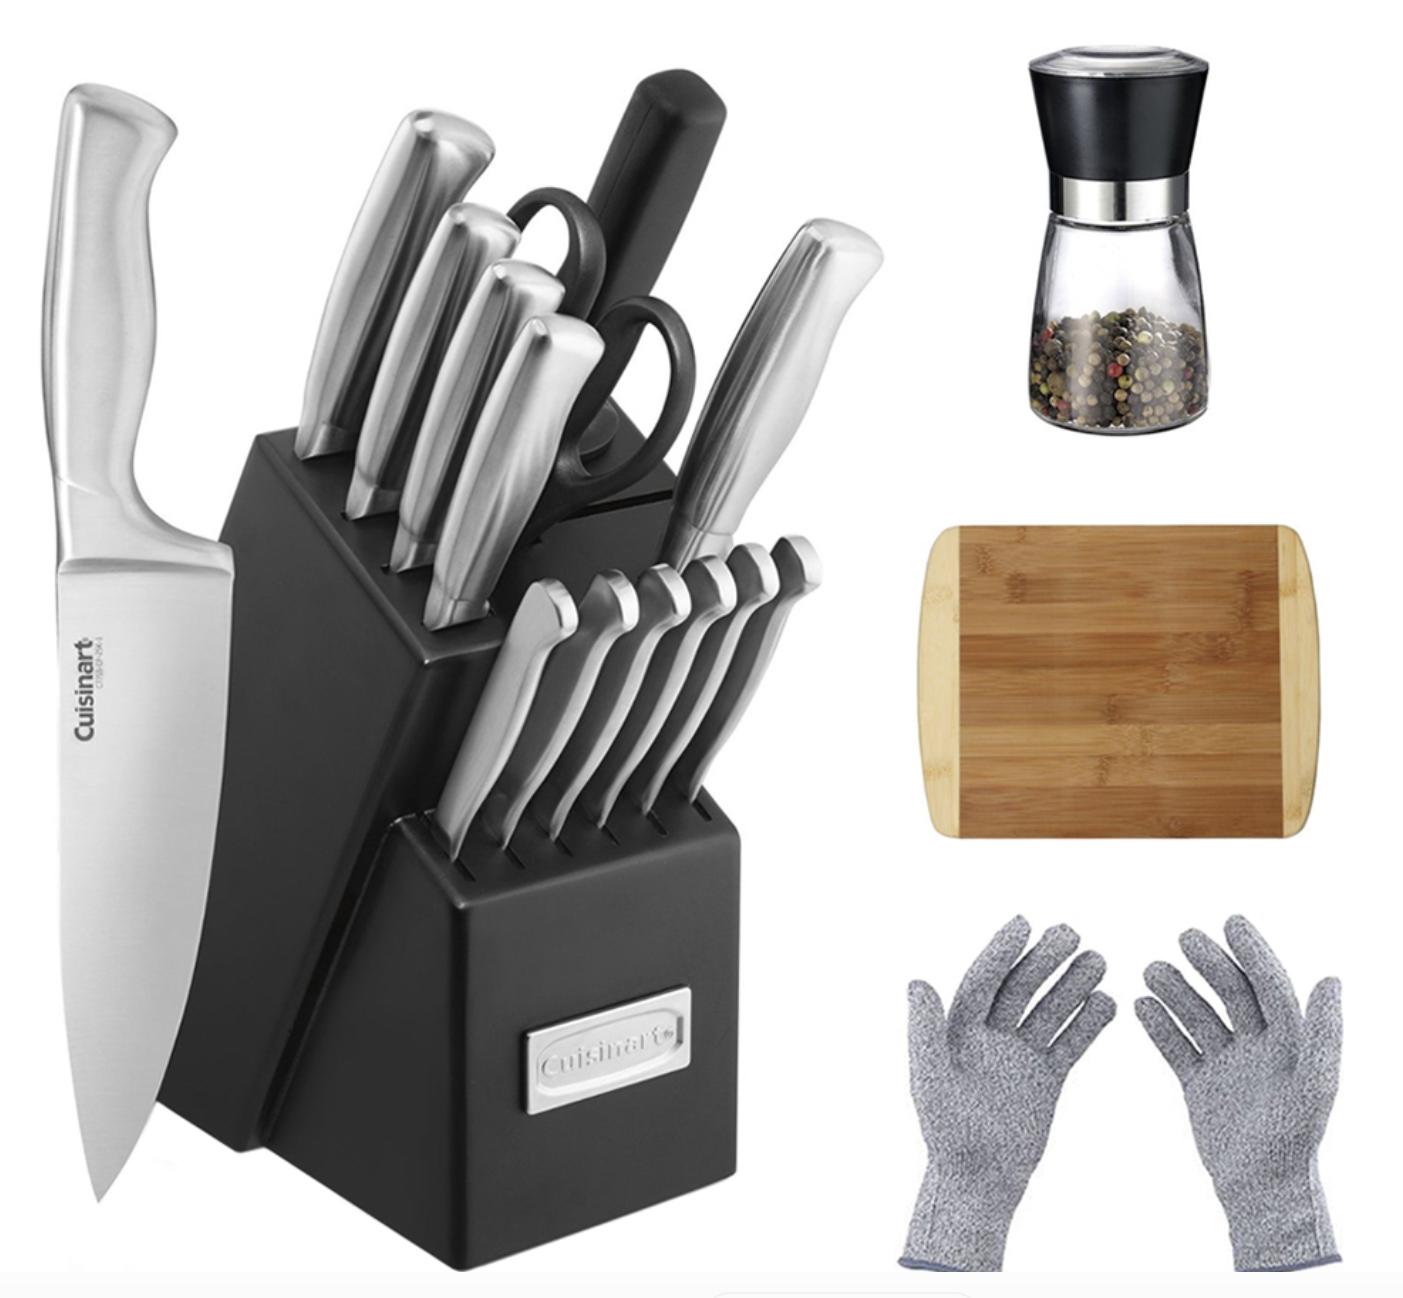 Cuisinart Stainless Steel Hollow Handle 15-Piece Cutlery Knife Block Set